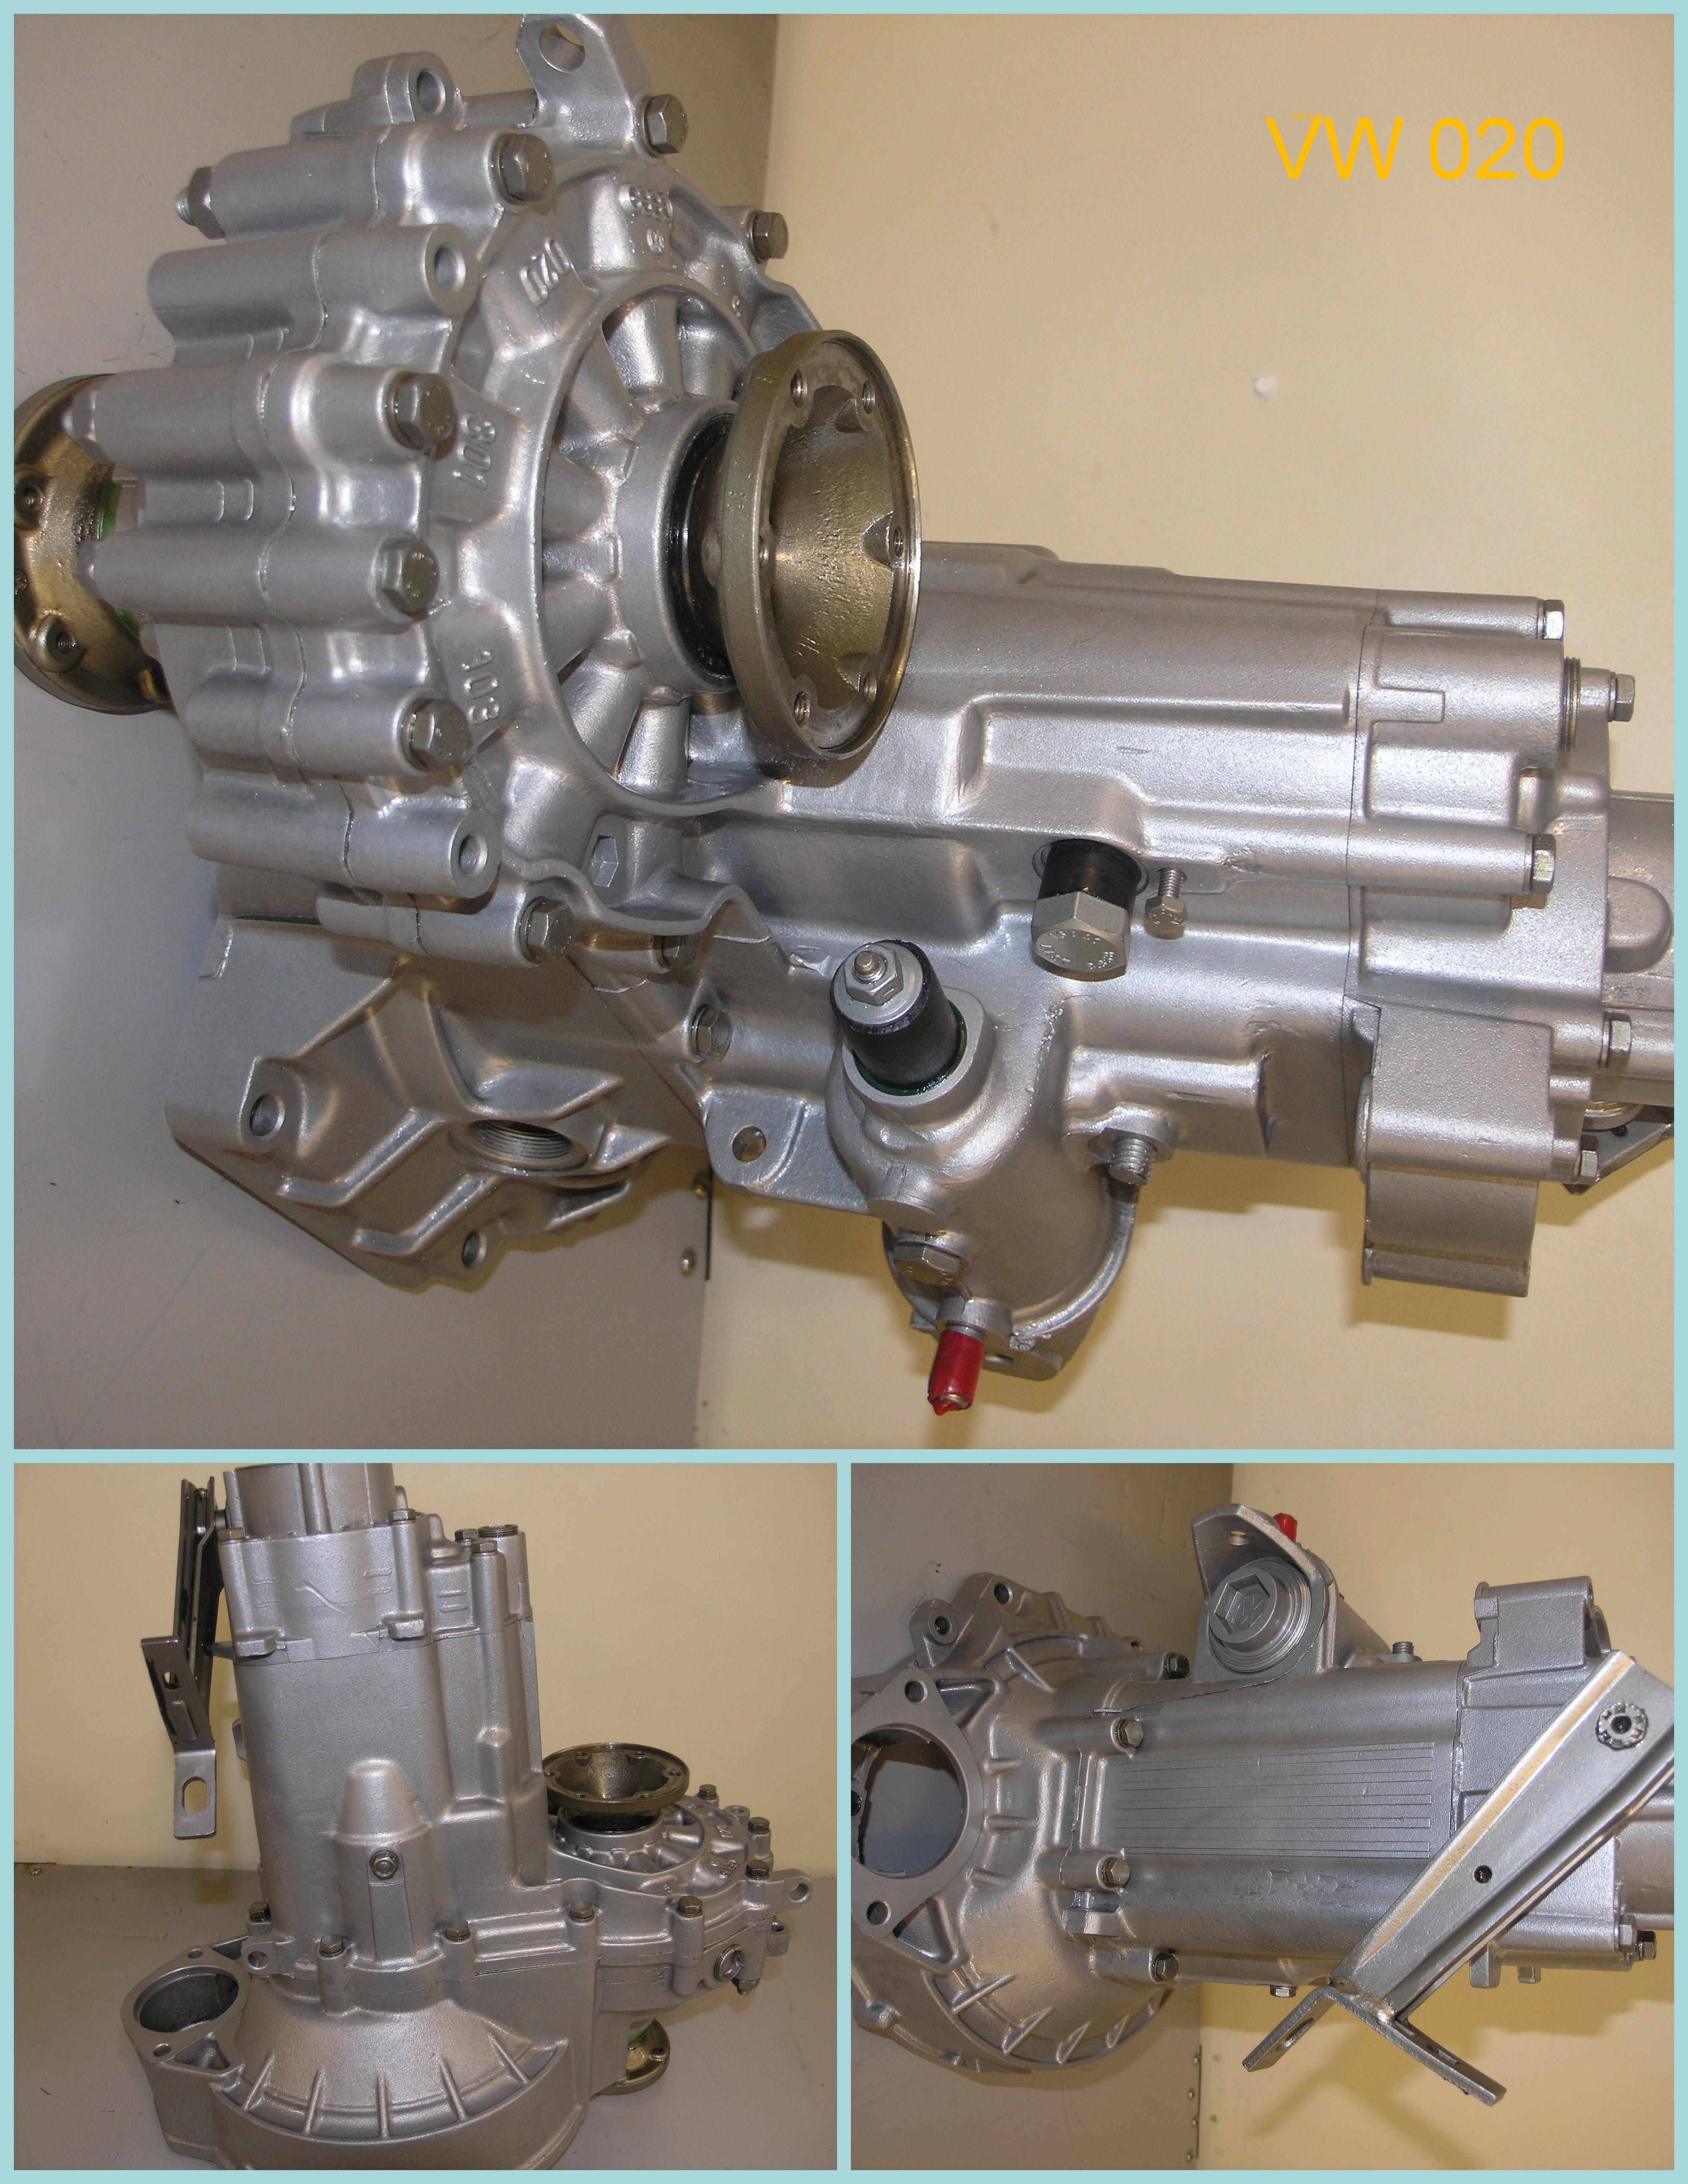 VW 020